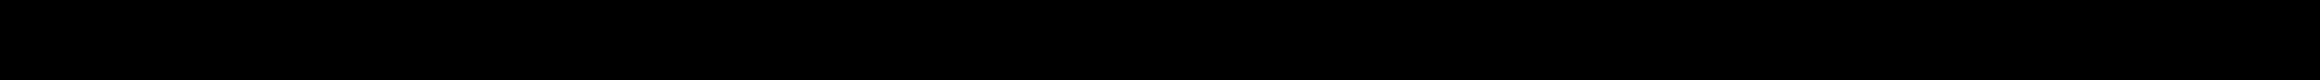 HERTH+BUSS ELPARTS 2000018605, VAS 1978/35-2 Ontgrendelgereedschap, platte- / ronde stekker